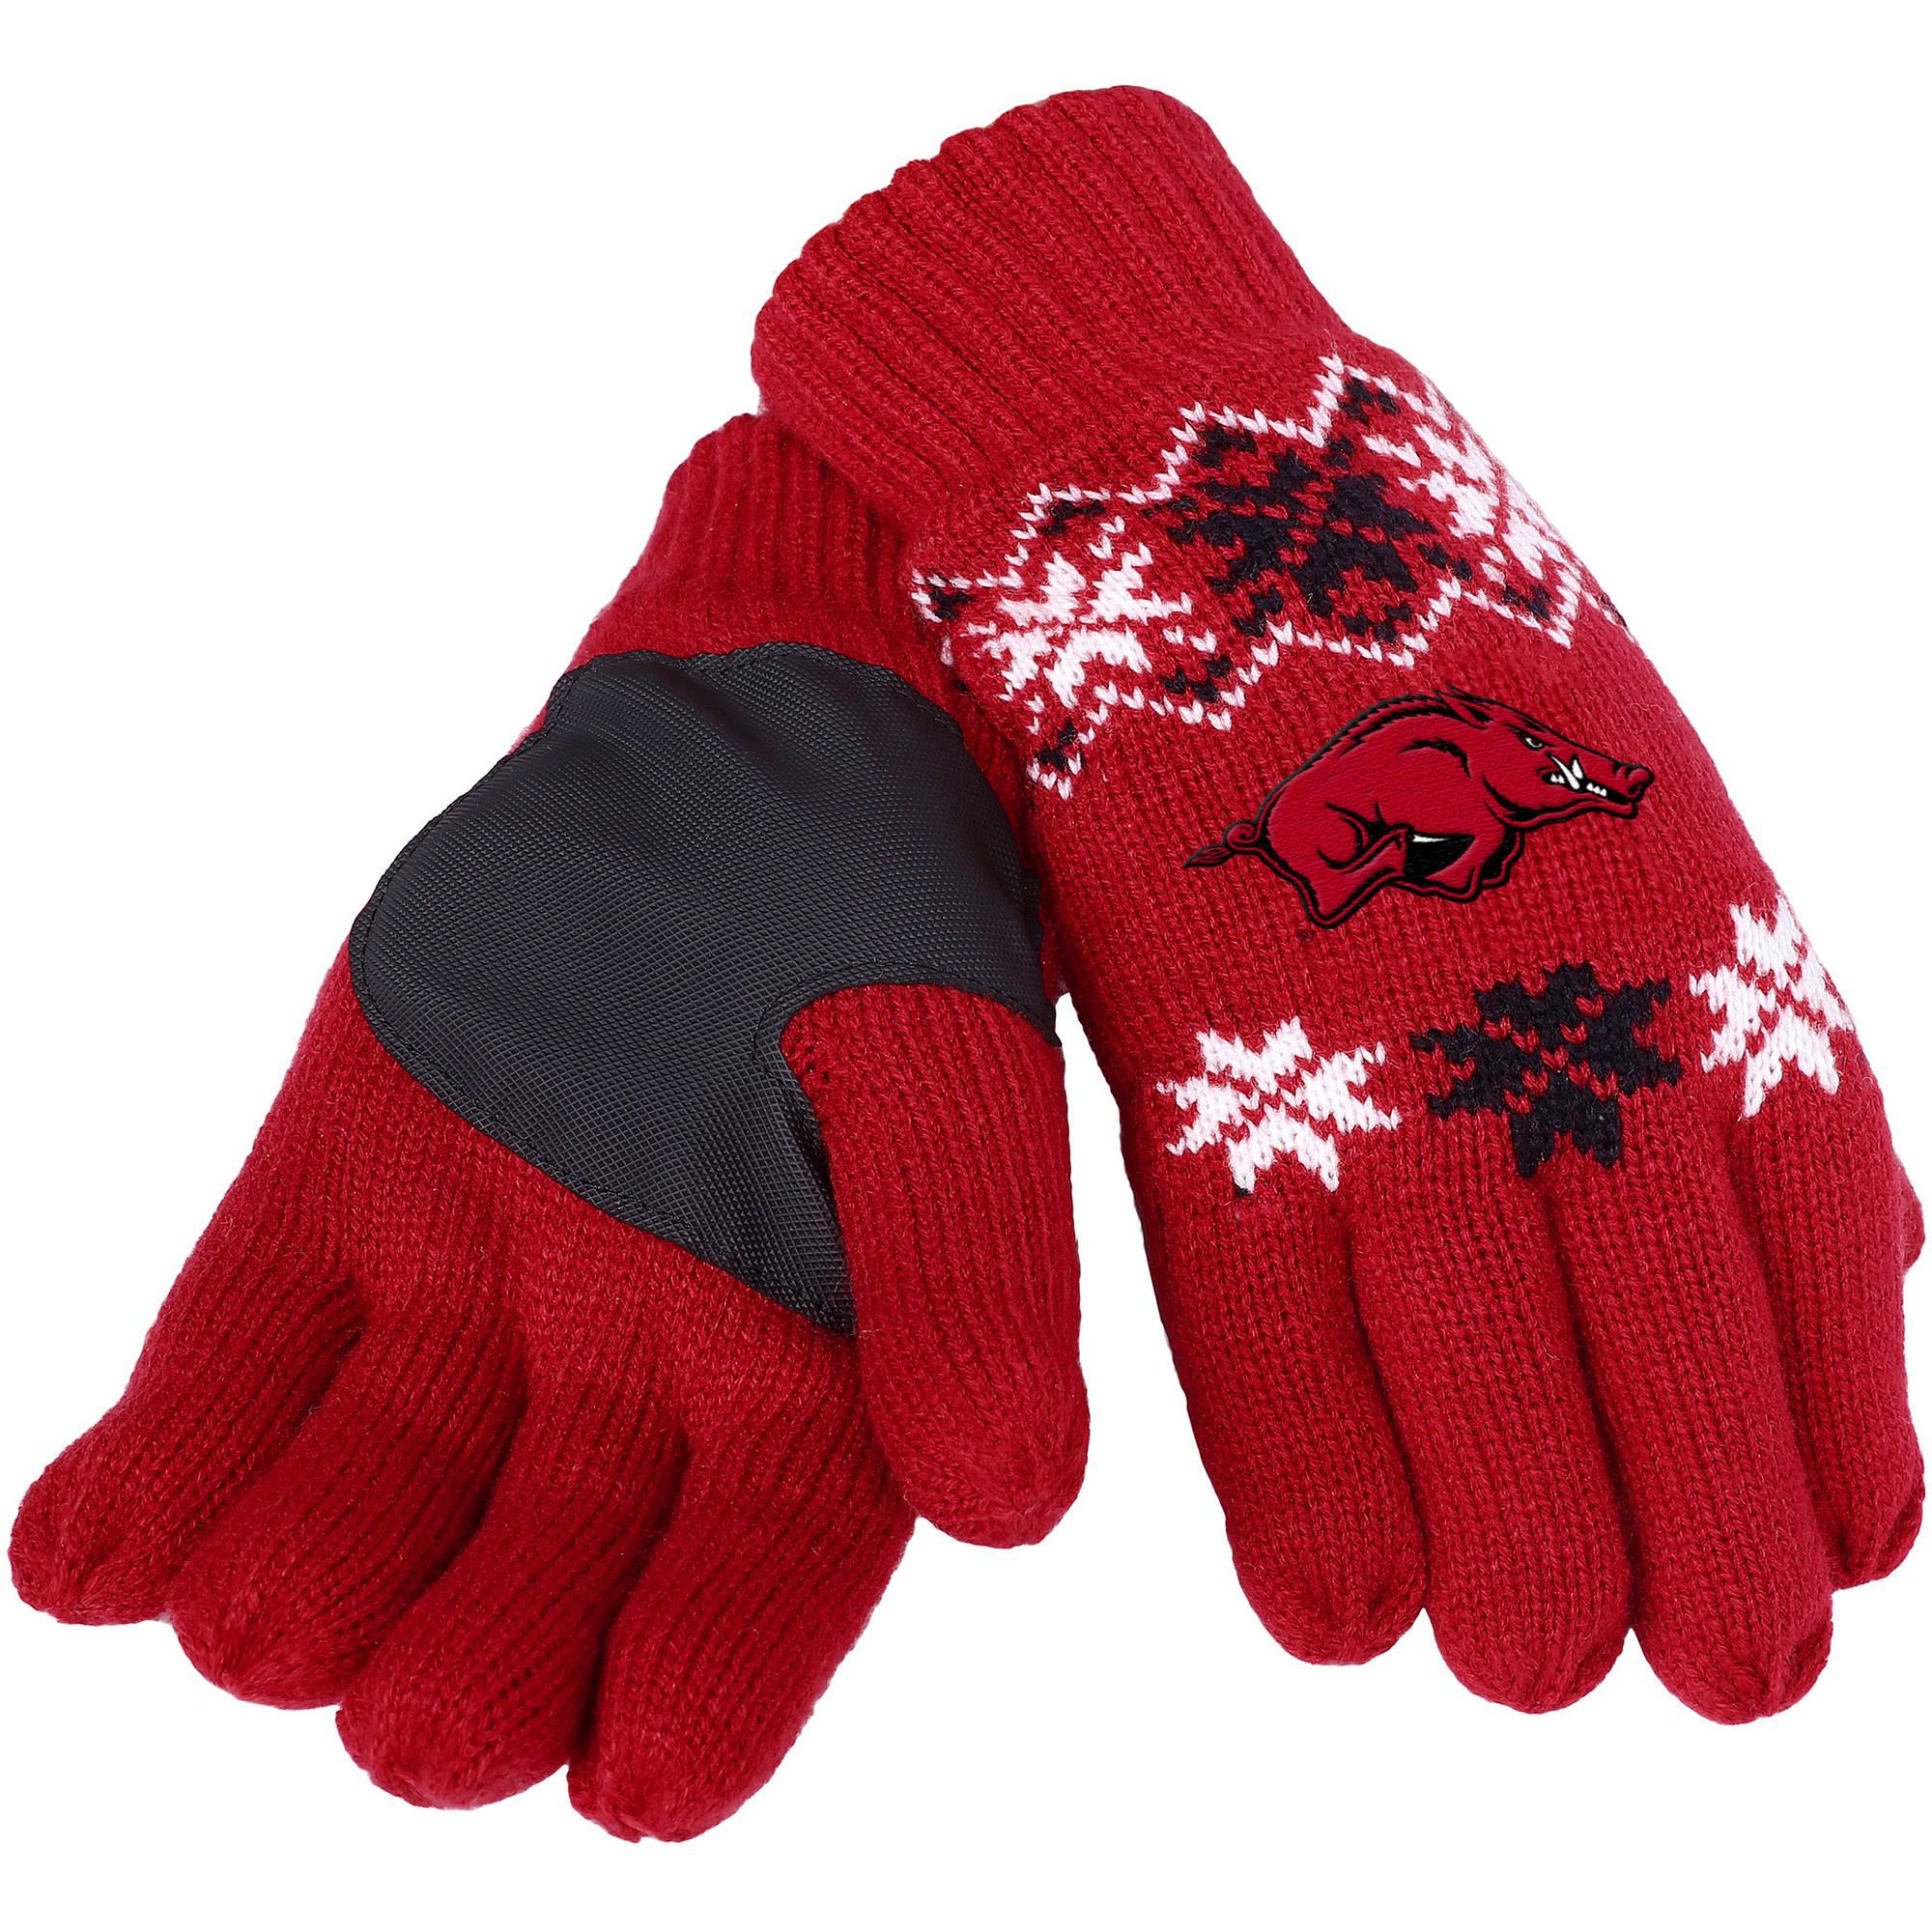 Forever Collectibles - NCAA Lodge Gloves, University of Arkansas Razorbacks